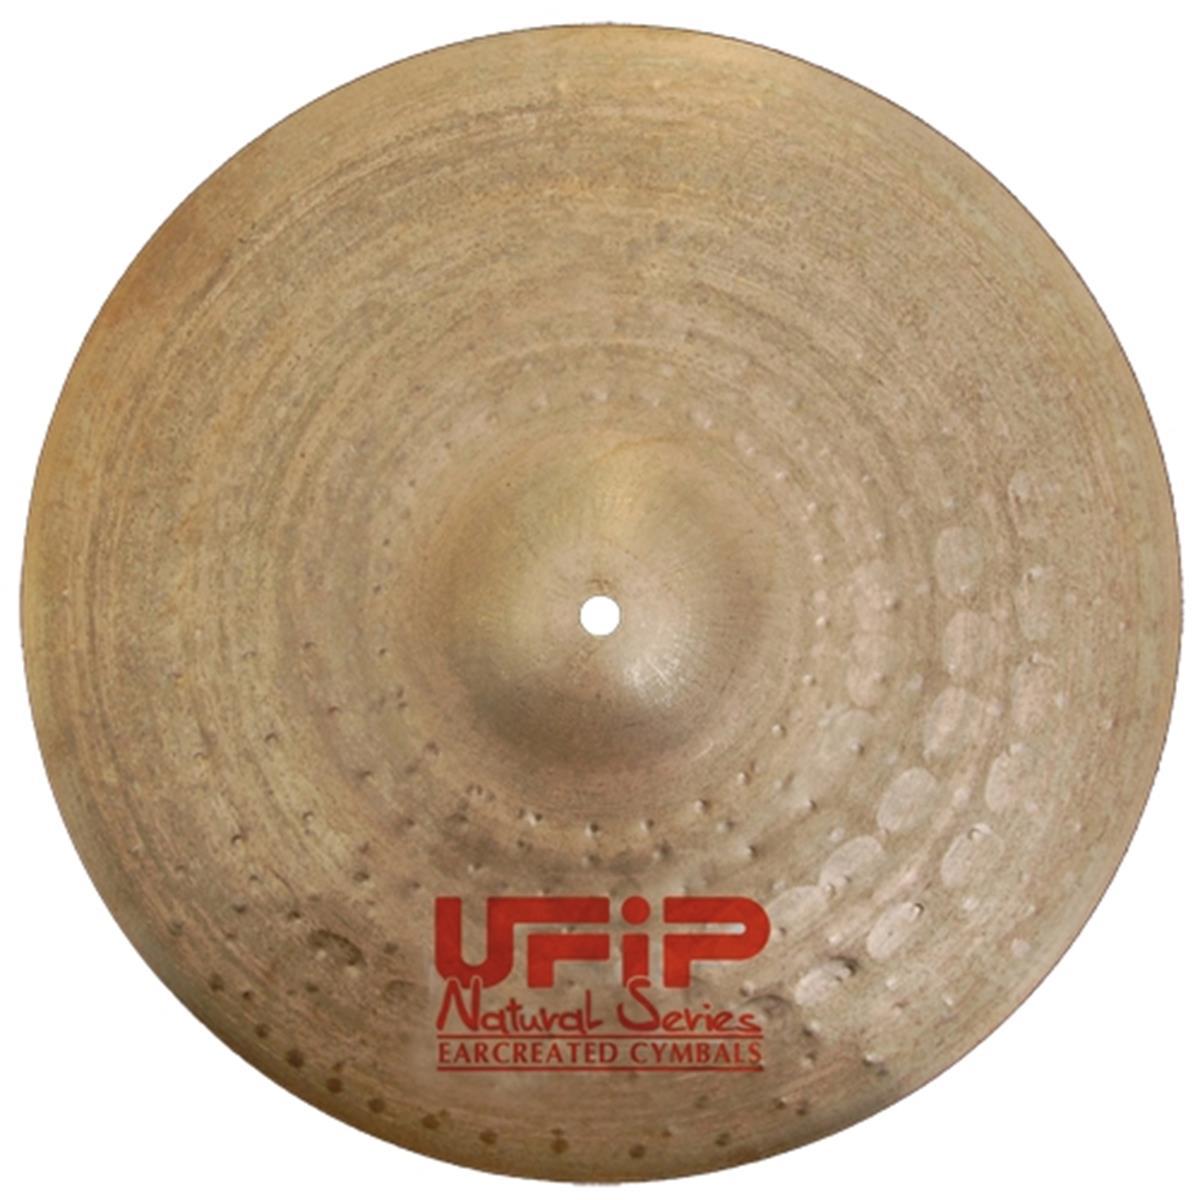 UFIP-NS-16-Natural-Series-16-Crash-sku-13134